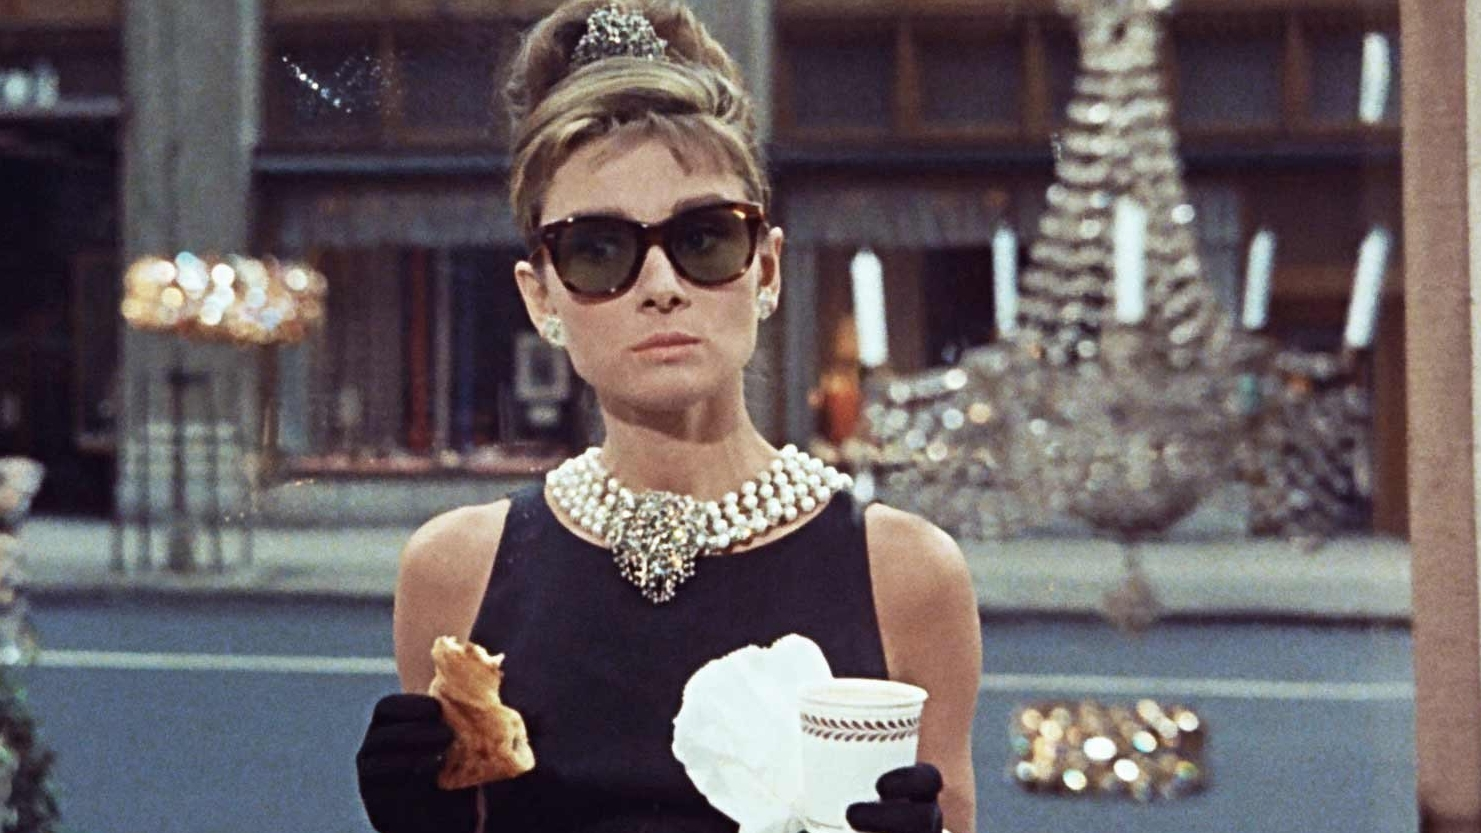 #61) Breakfast at Tiffany's - (1961 - dir. Blake Edwards)